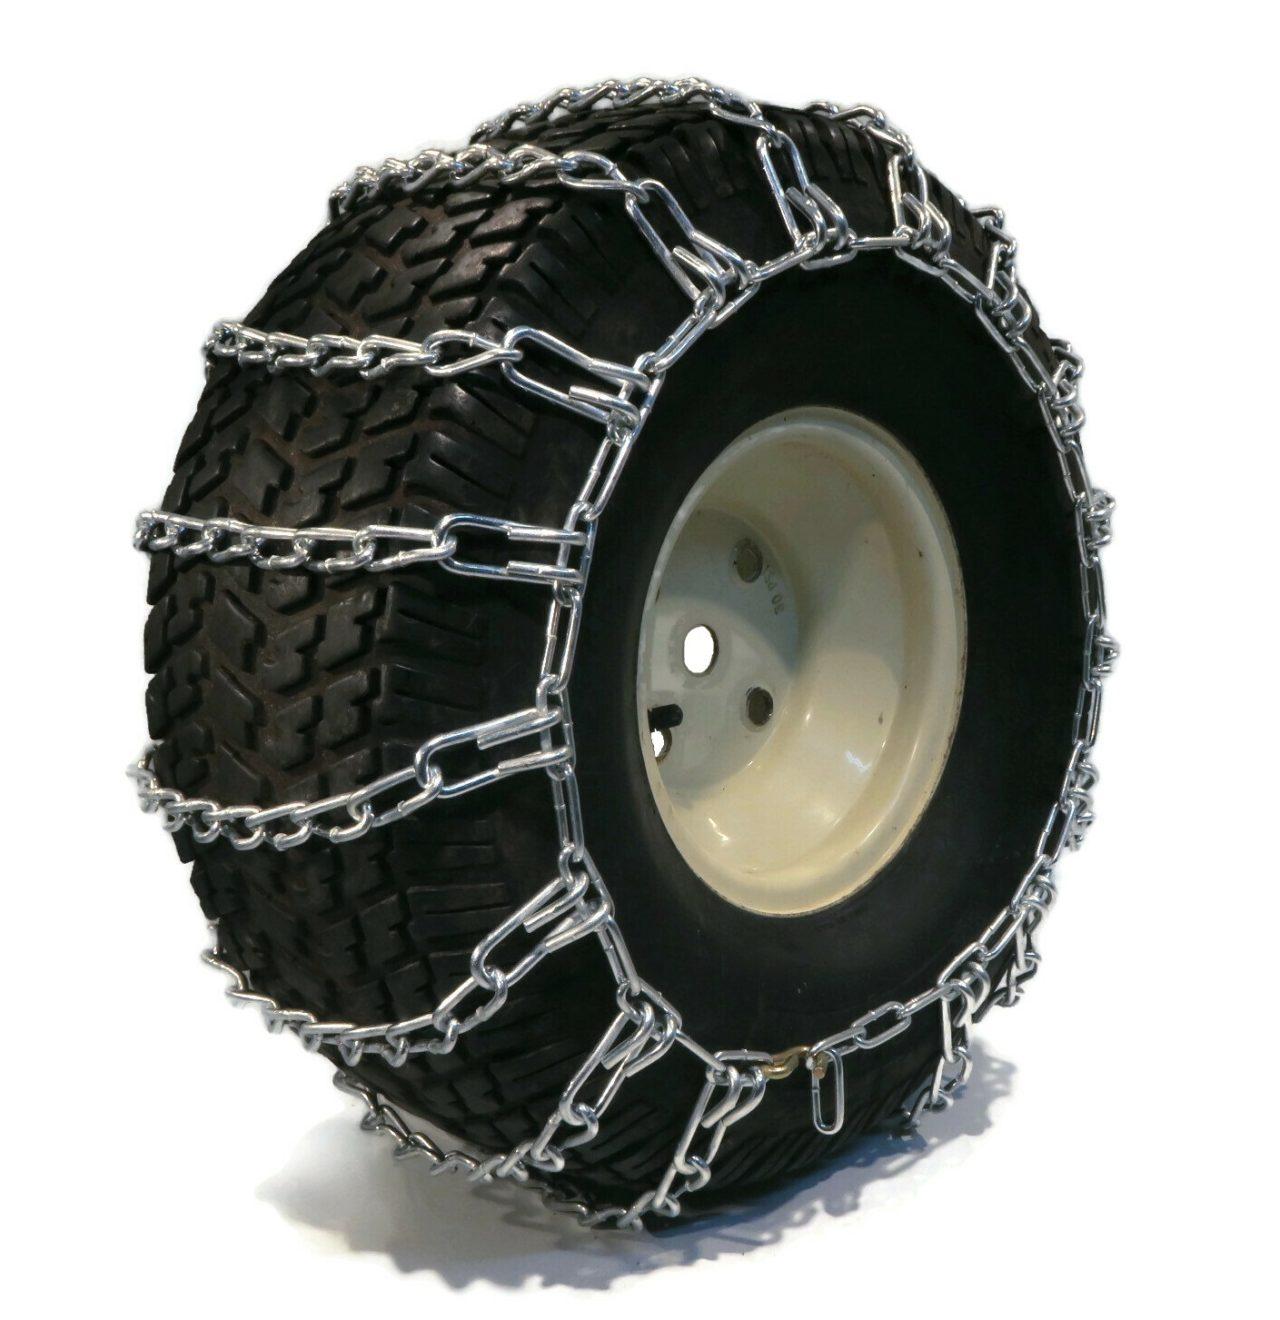 The ROP Shop Pair 2 Link TIRE Chains 23x10.50x12 22x11x8 22x11x10 23x10x12 24x9.5x12 for UTV ATV Vehicle